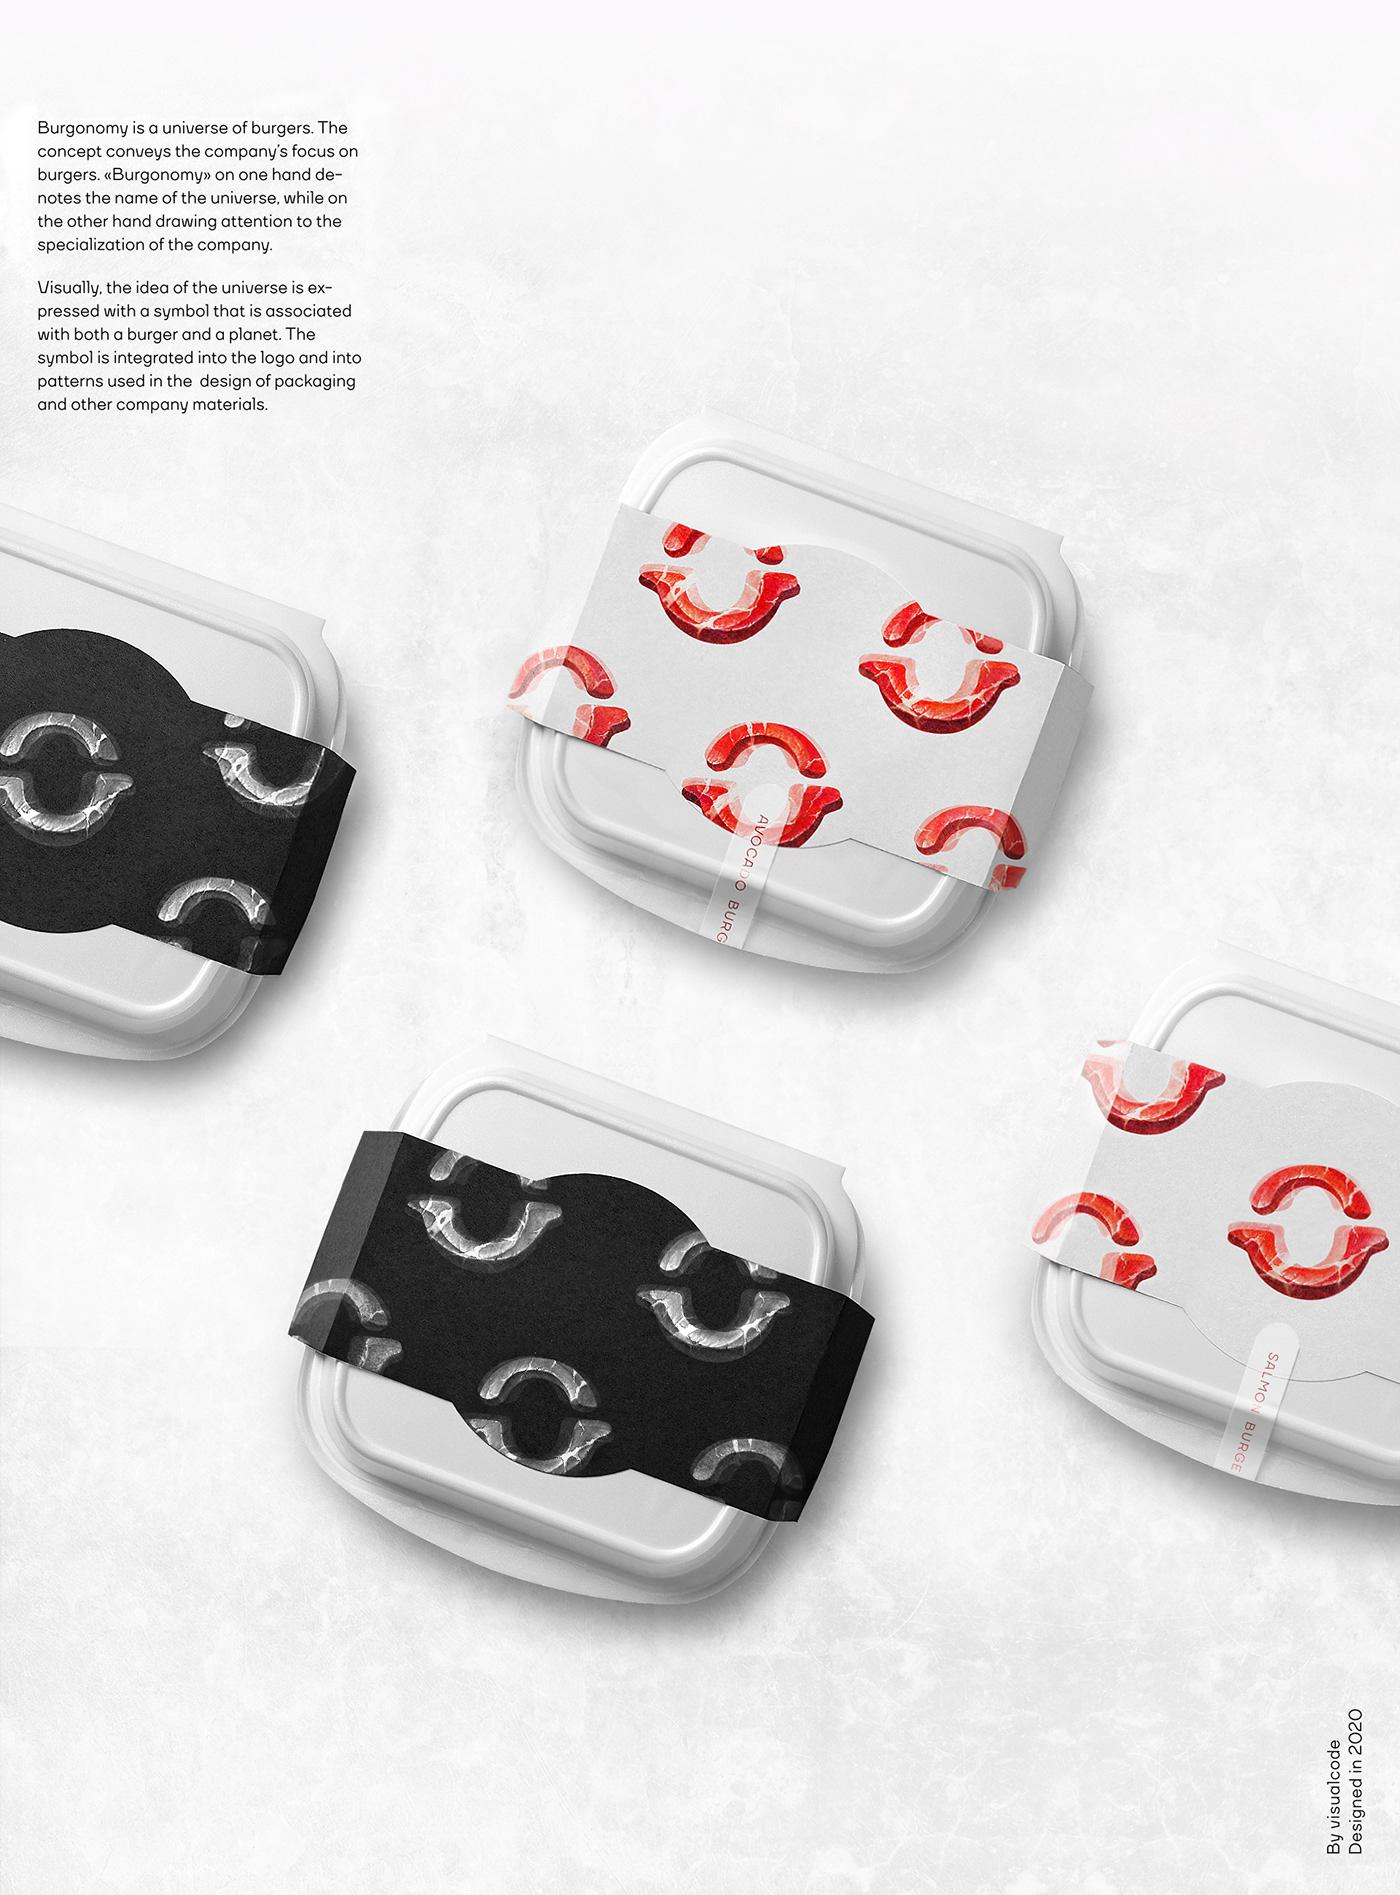 branding  brand identity burger Food  Logotype meat Packaging Space  symbol Visualcode